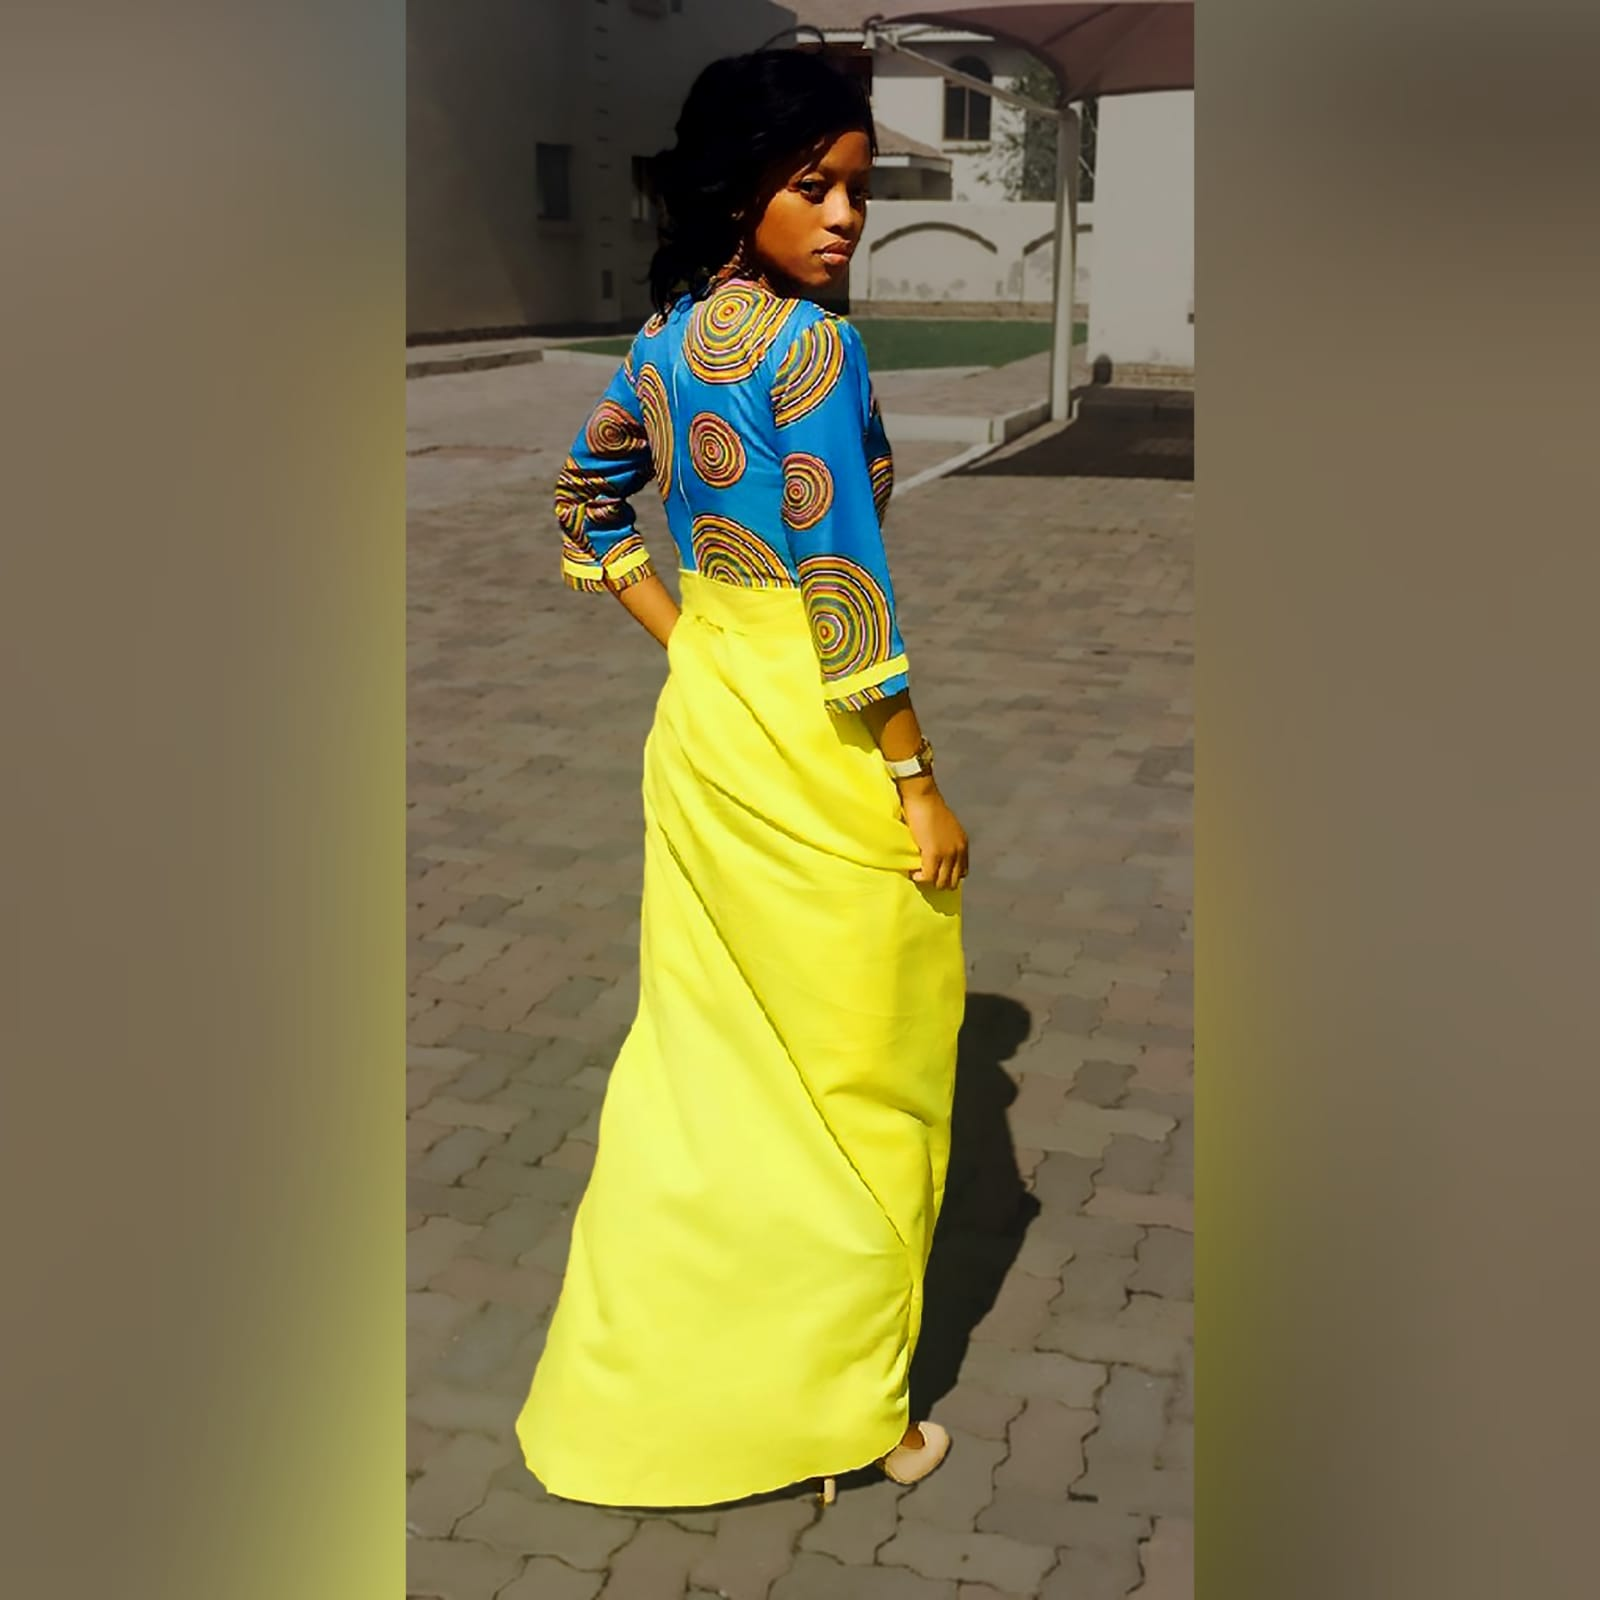 Blue & yellow modern traditional dress 3 modern traditional blue and yellow empire fit dress. Flowy bottom, neckline with a slit.